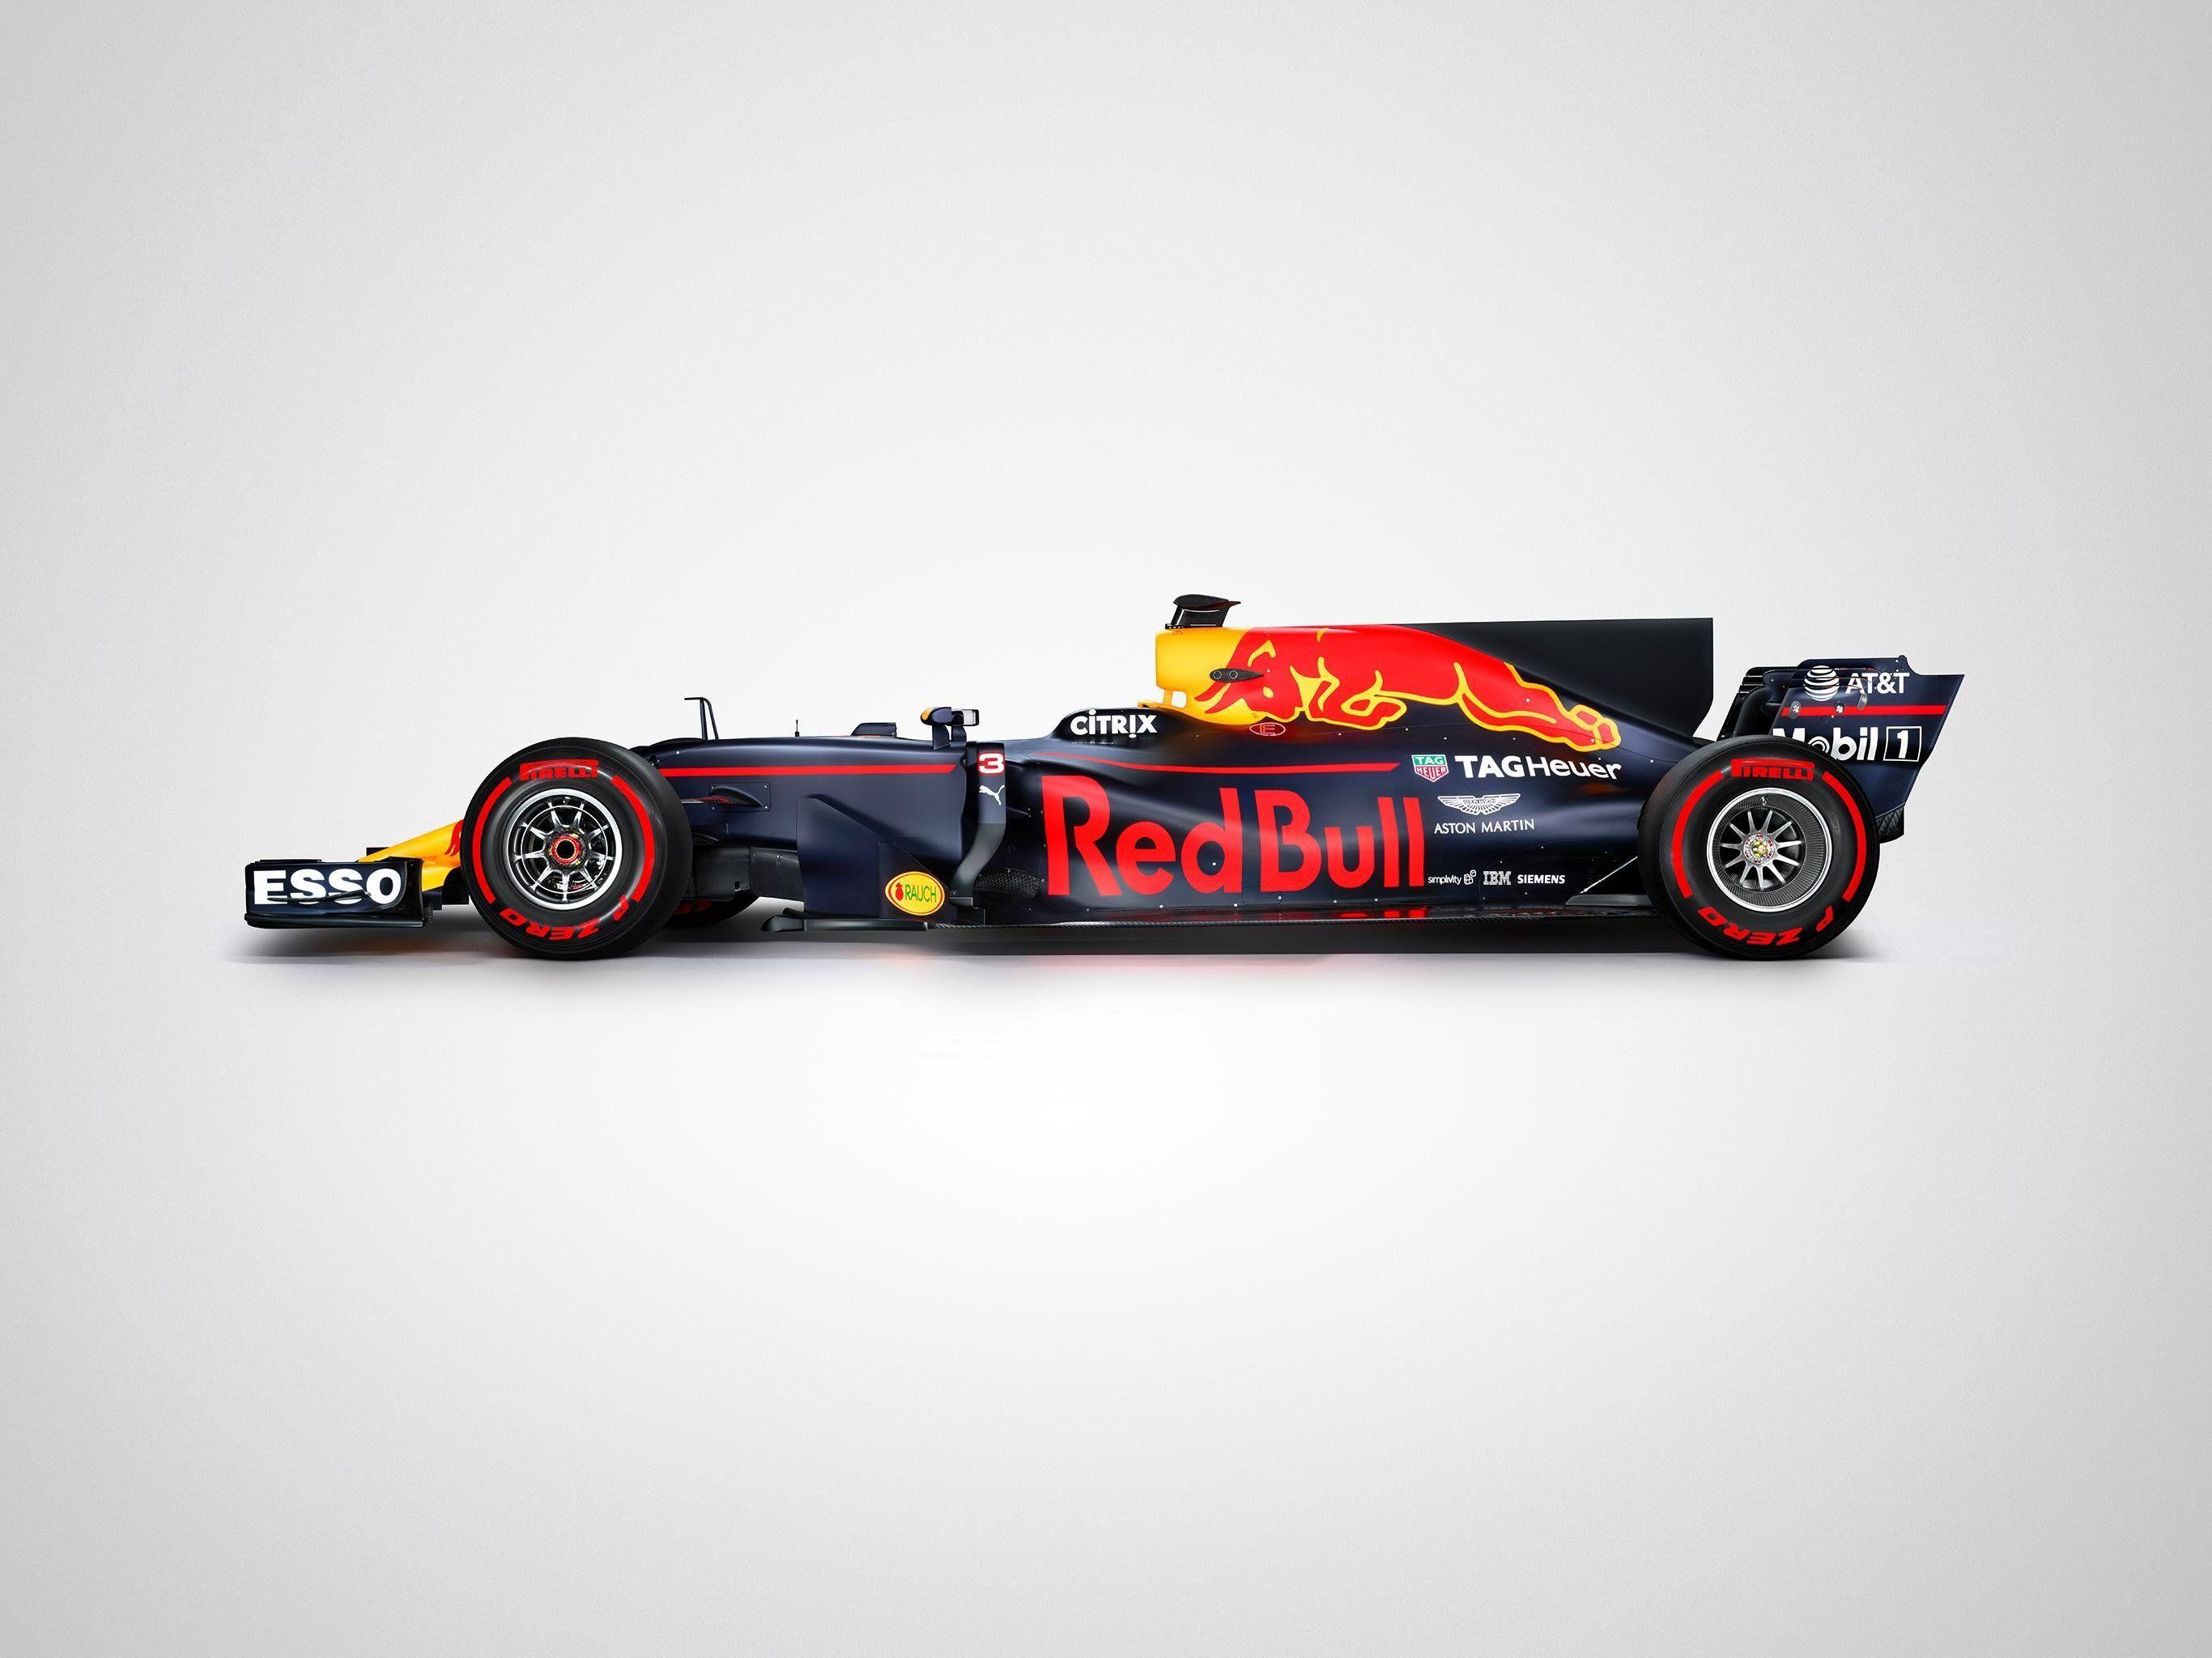 Rb13 Redbullracing 2017 Red Bull Racing Red Bull F1 Car Max